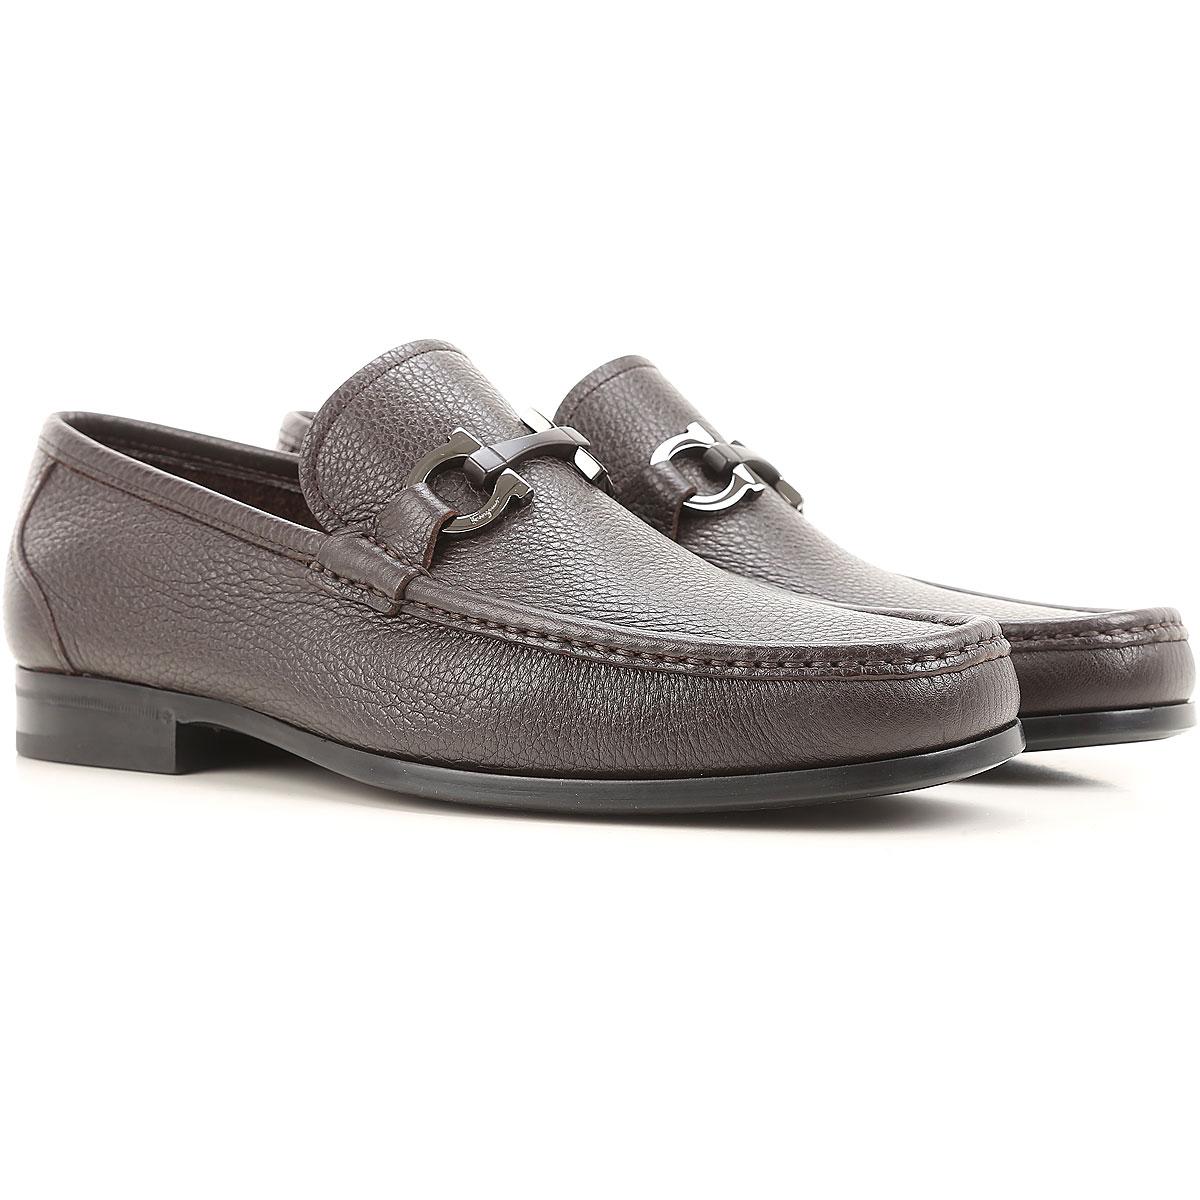 Image of Salvatore Ferragamo Loafers for Men, Dark Brown, Leather, 2017, 10 11 6 6.5 7.5 8.5 9 9.5